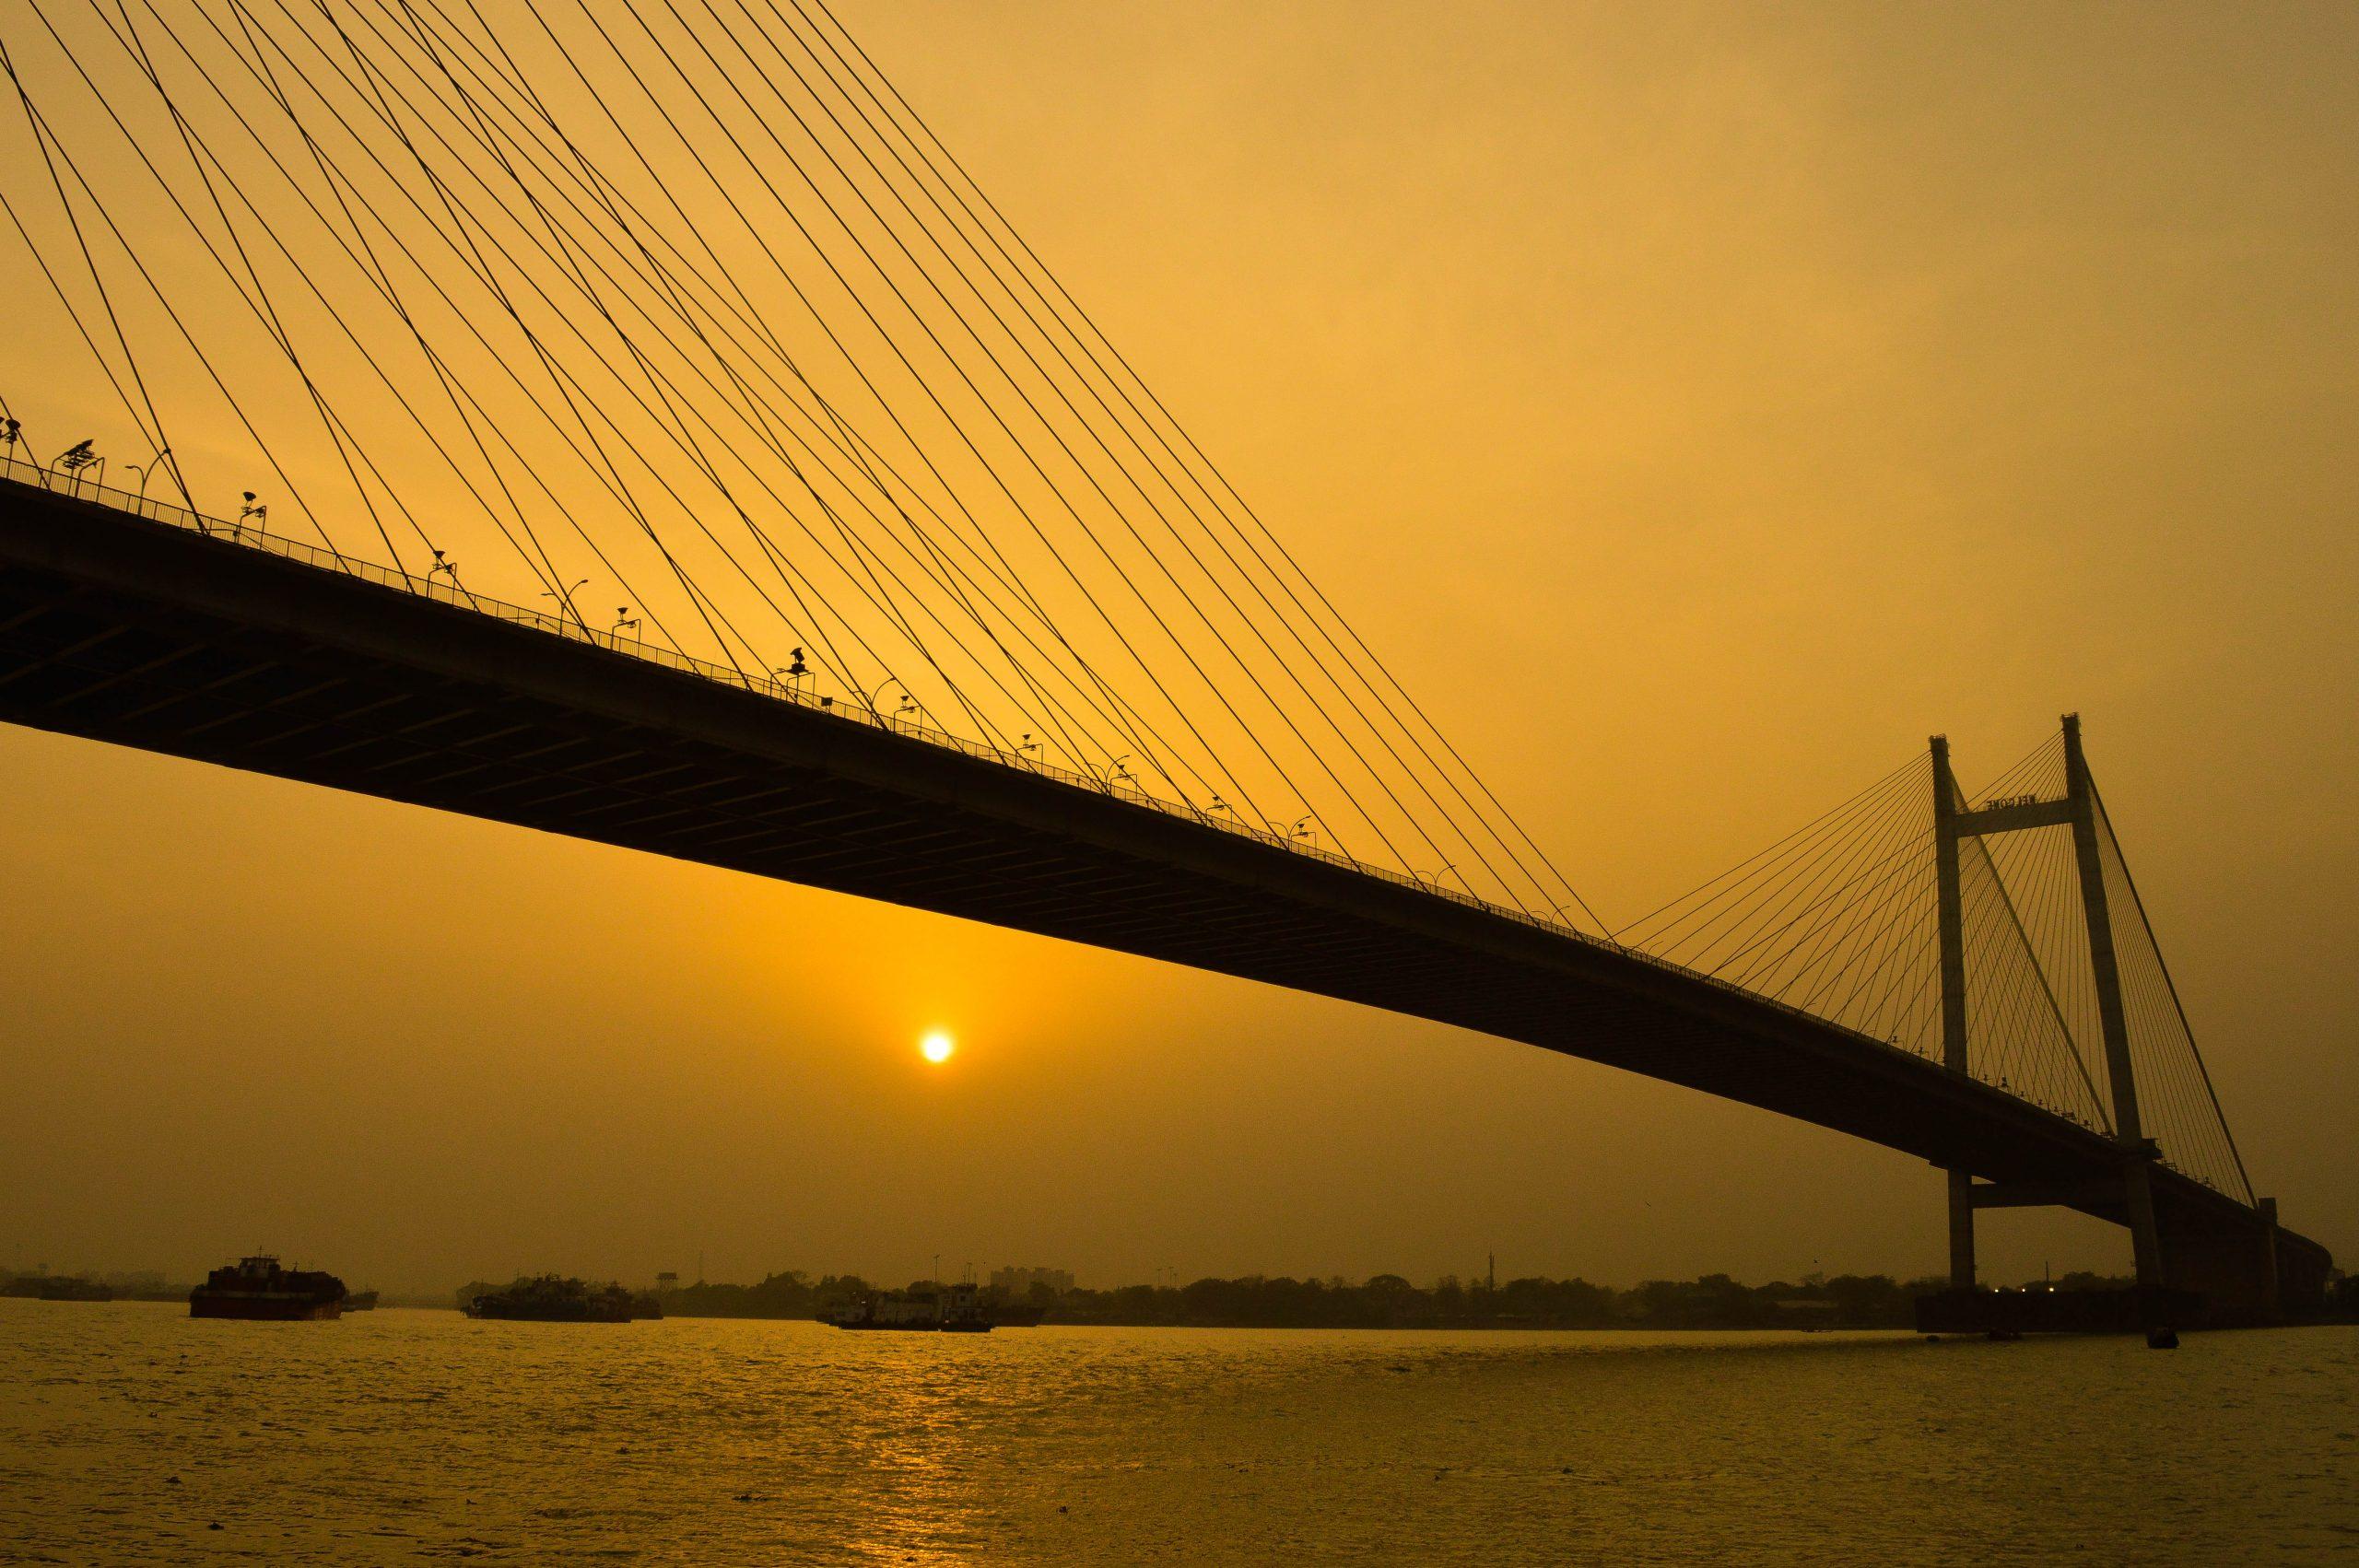 Vidhyasgar bridge and sunset in background